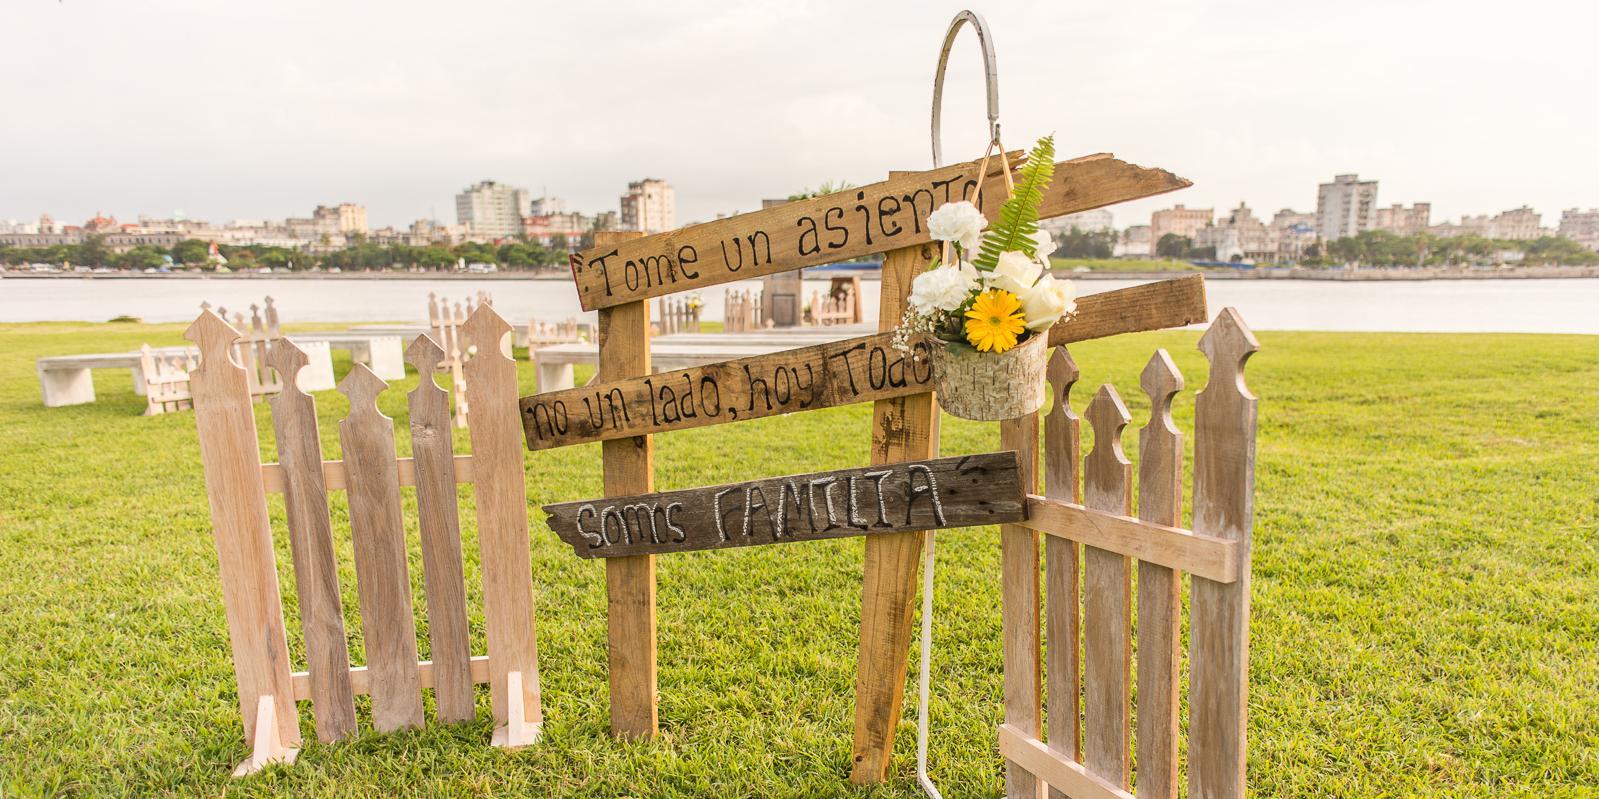 bodas-estilo-libre-jardin-cuba-8851.jpg